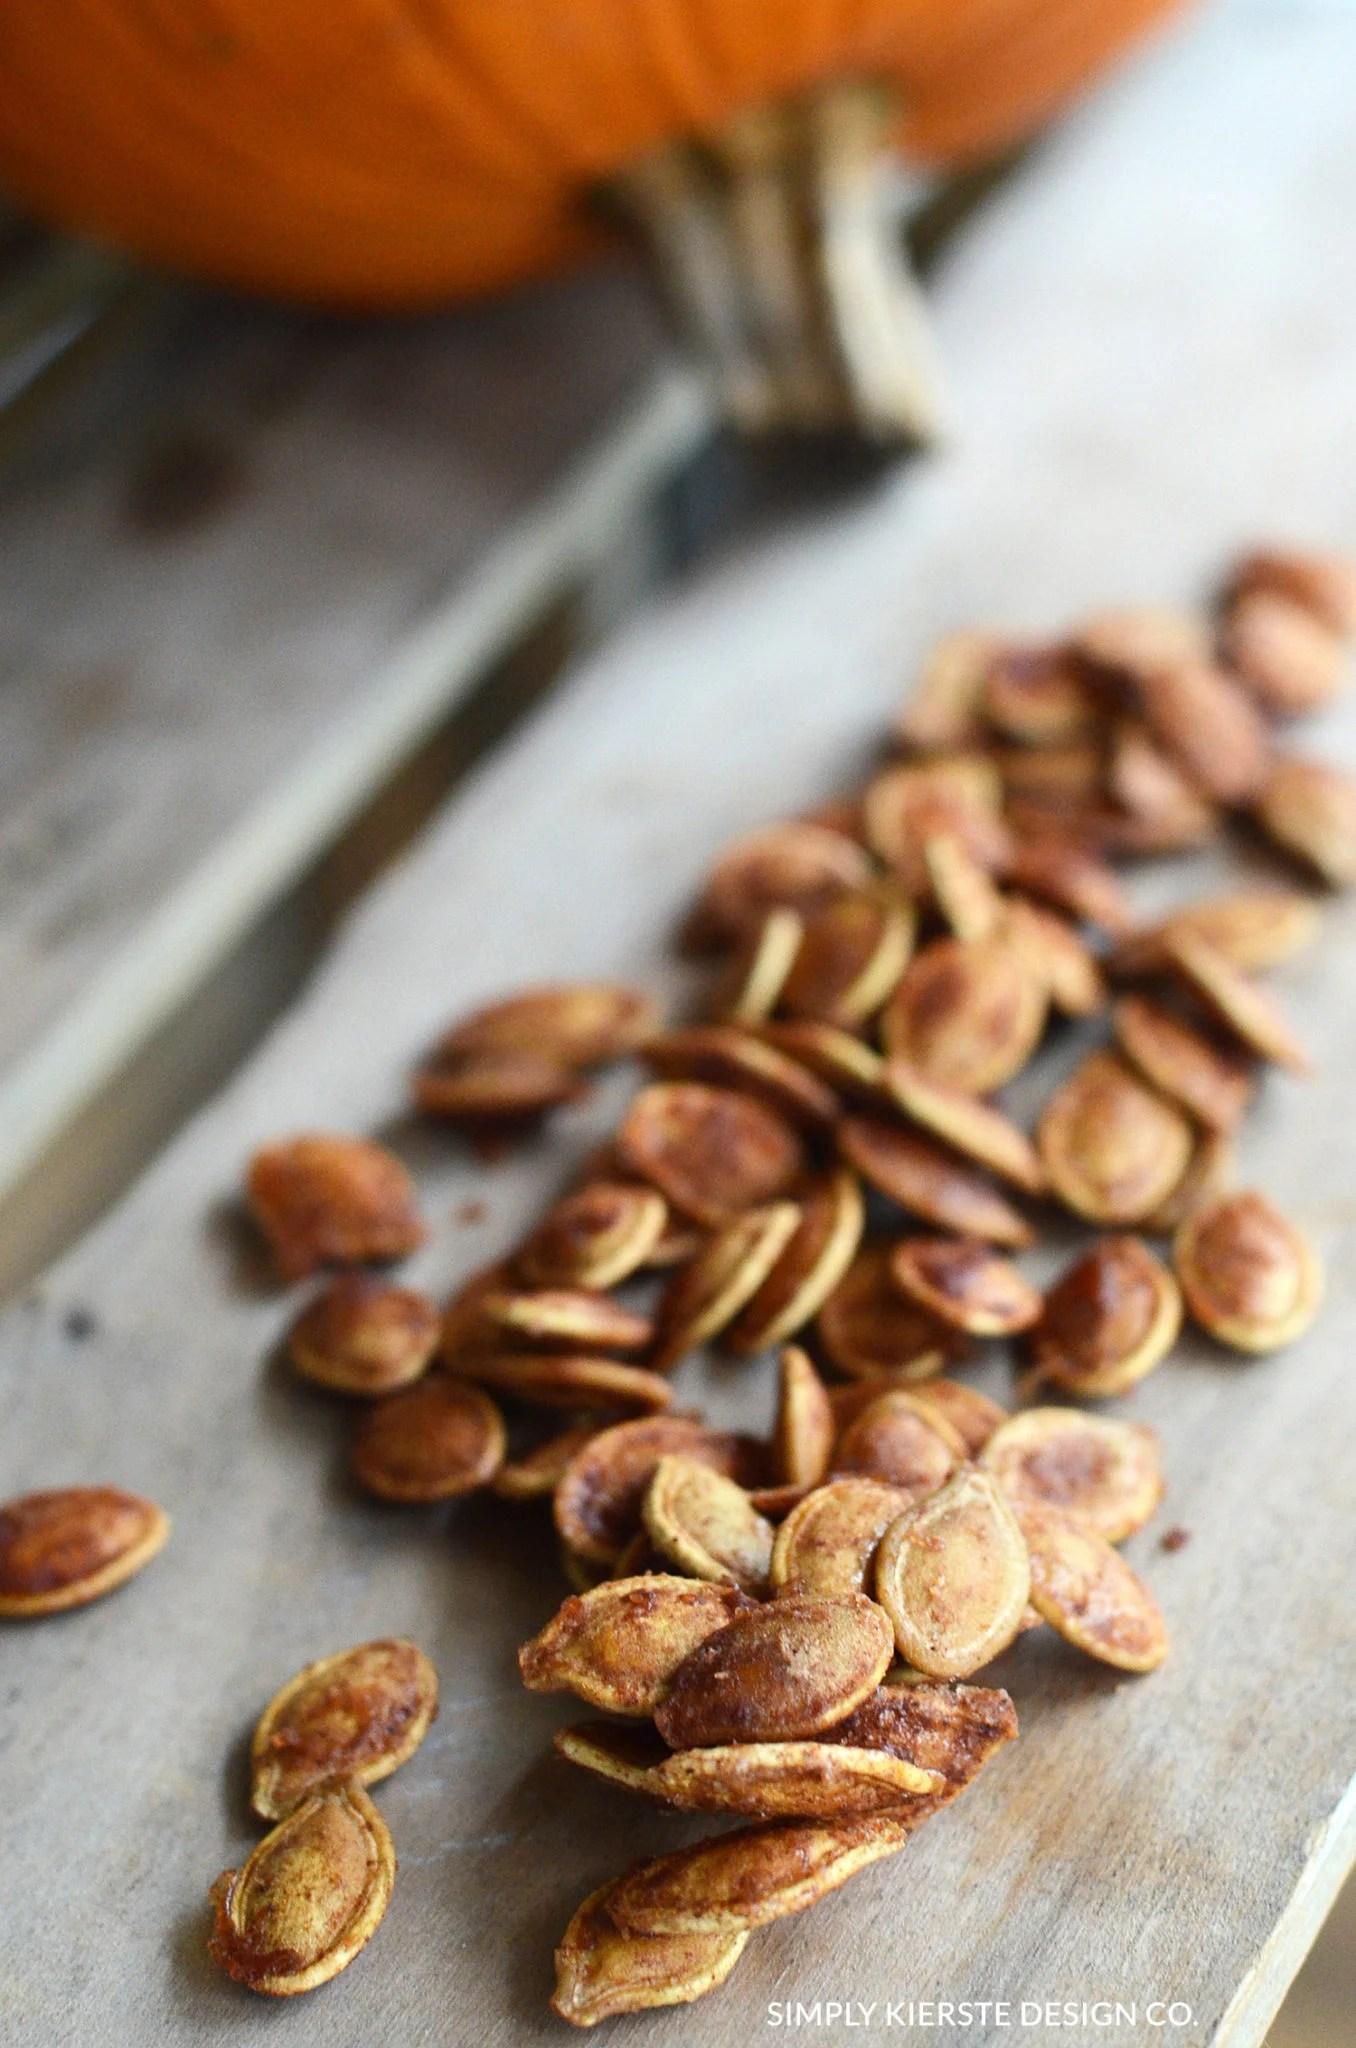 Toasted Pumpkin Seeds | Cinnamon & Sugar Pumpkin Seeds | Fall Recipes | oldsaltfarm.com